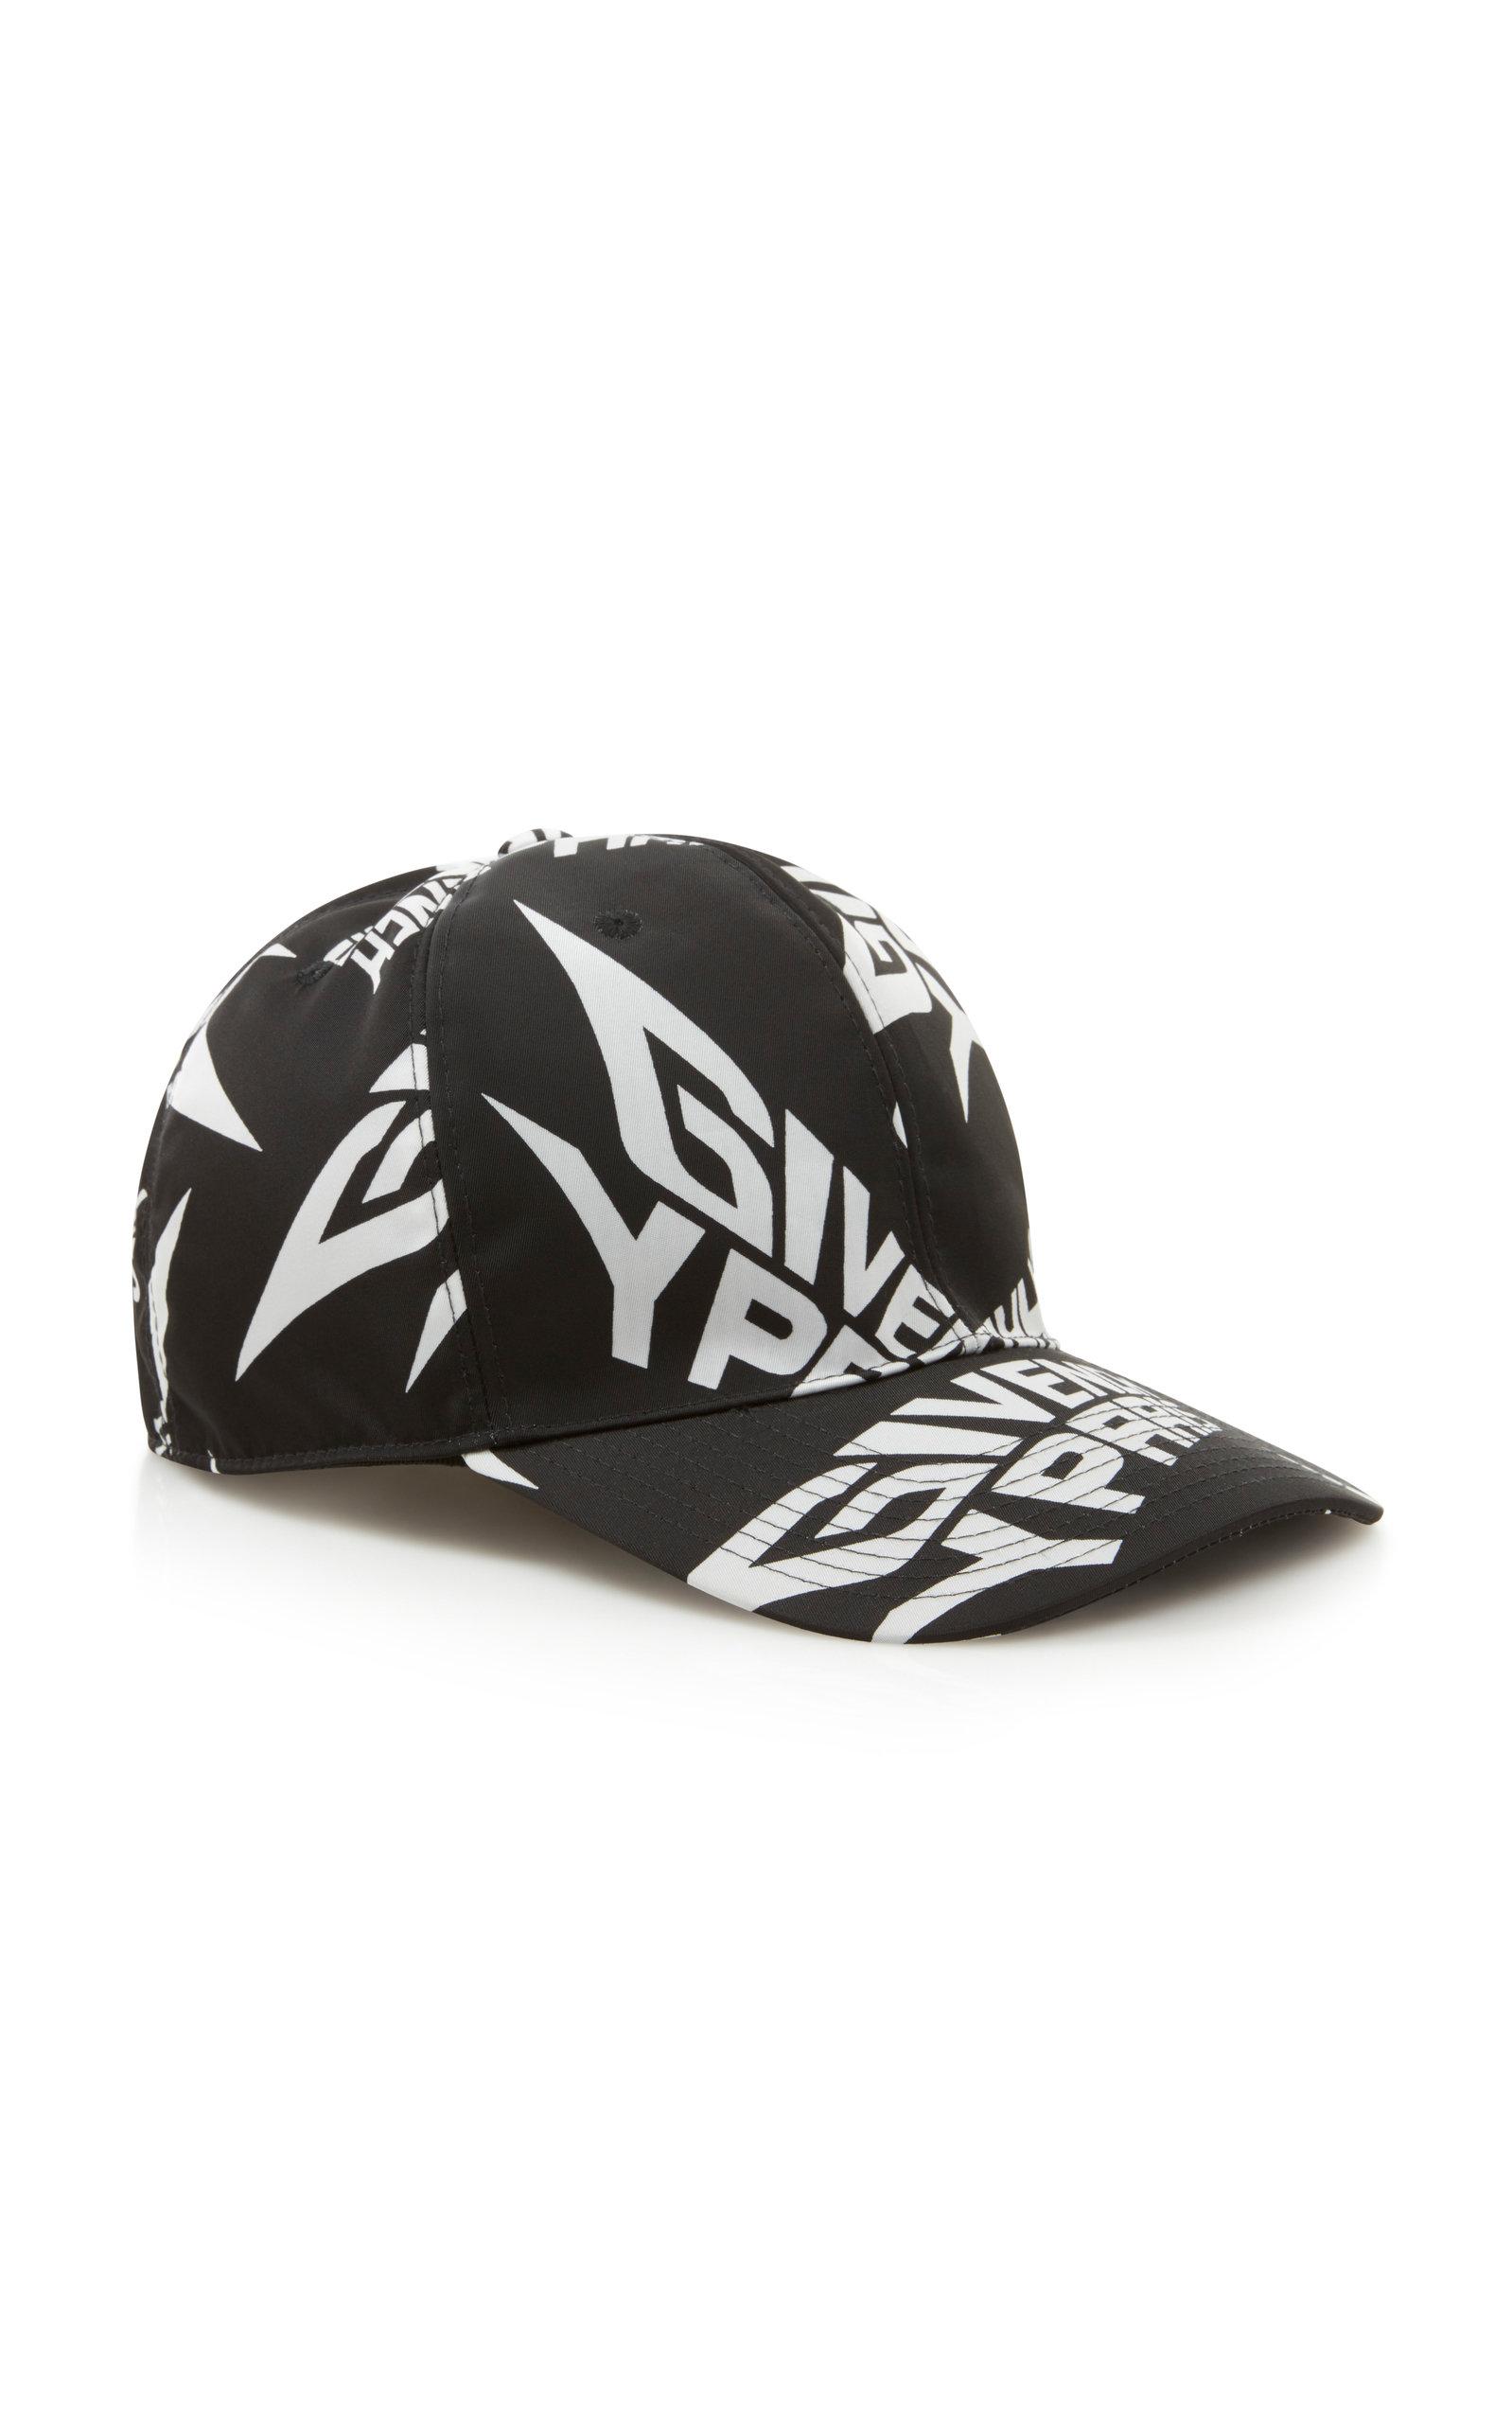 42df2545 Men's Hats   Moda Operandi   Moda Operandi